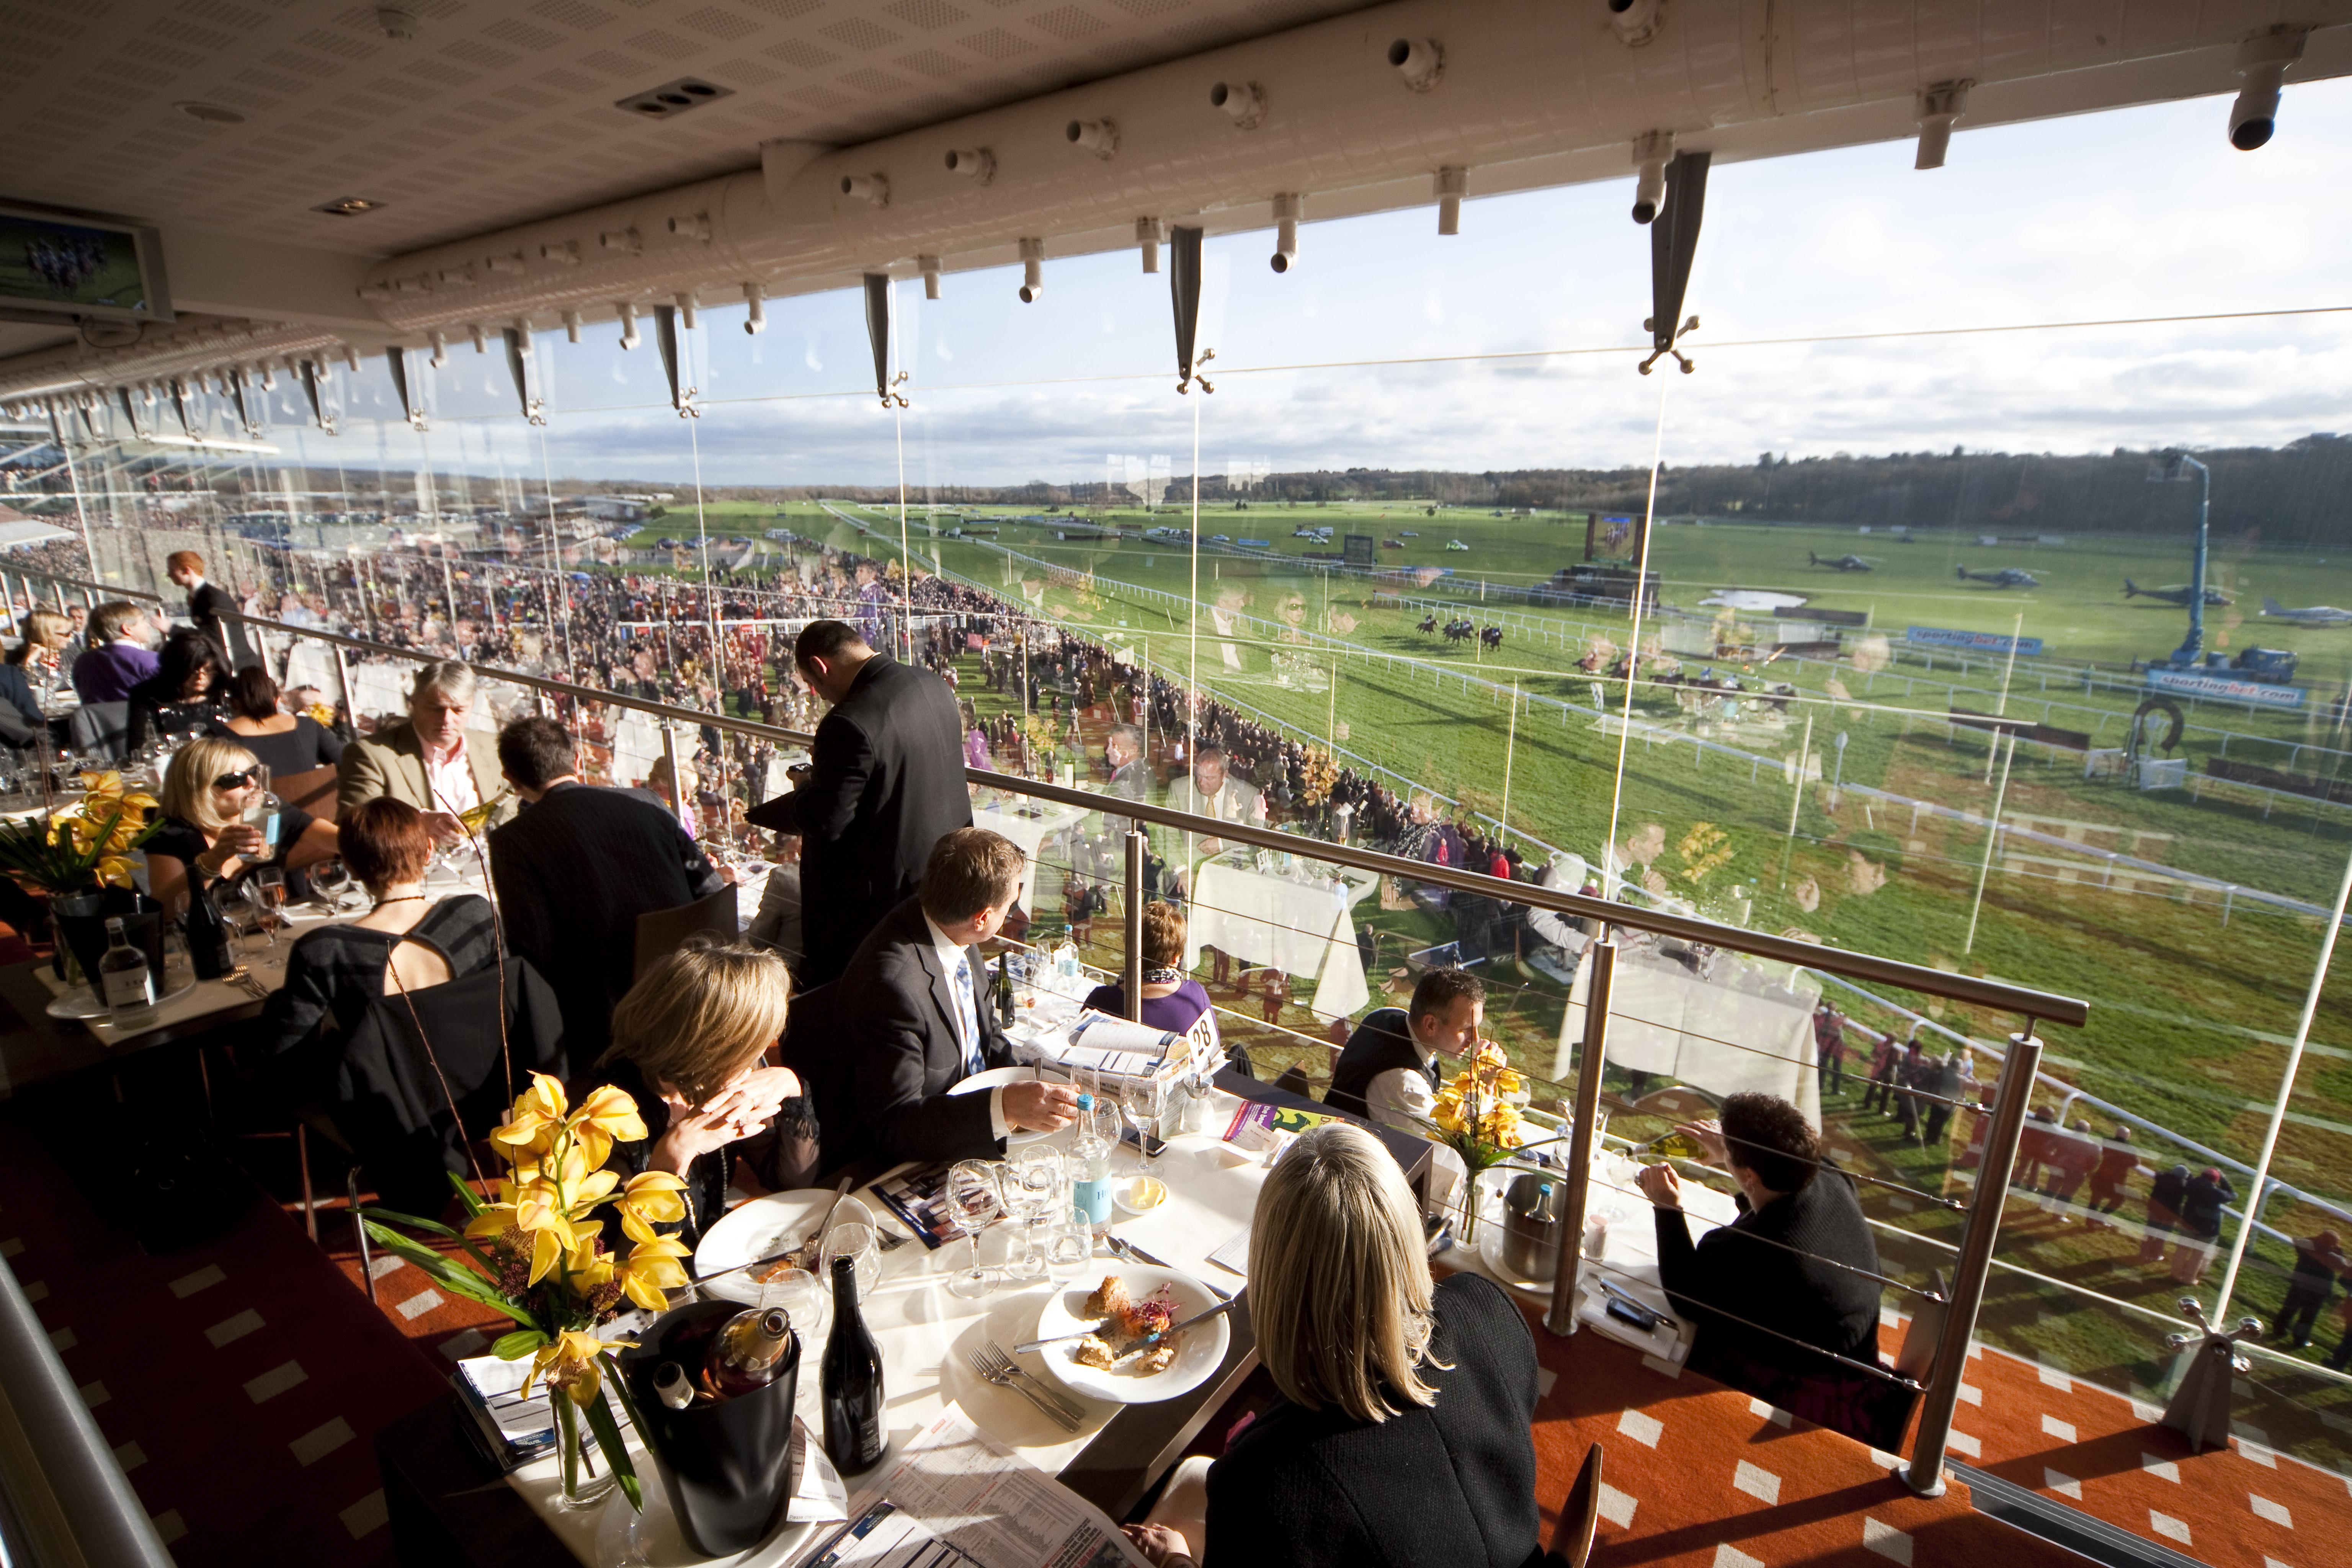 Restaurants newbury racecourse for The restaurant